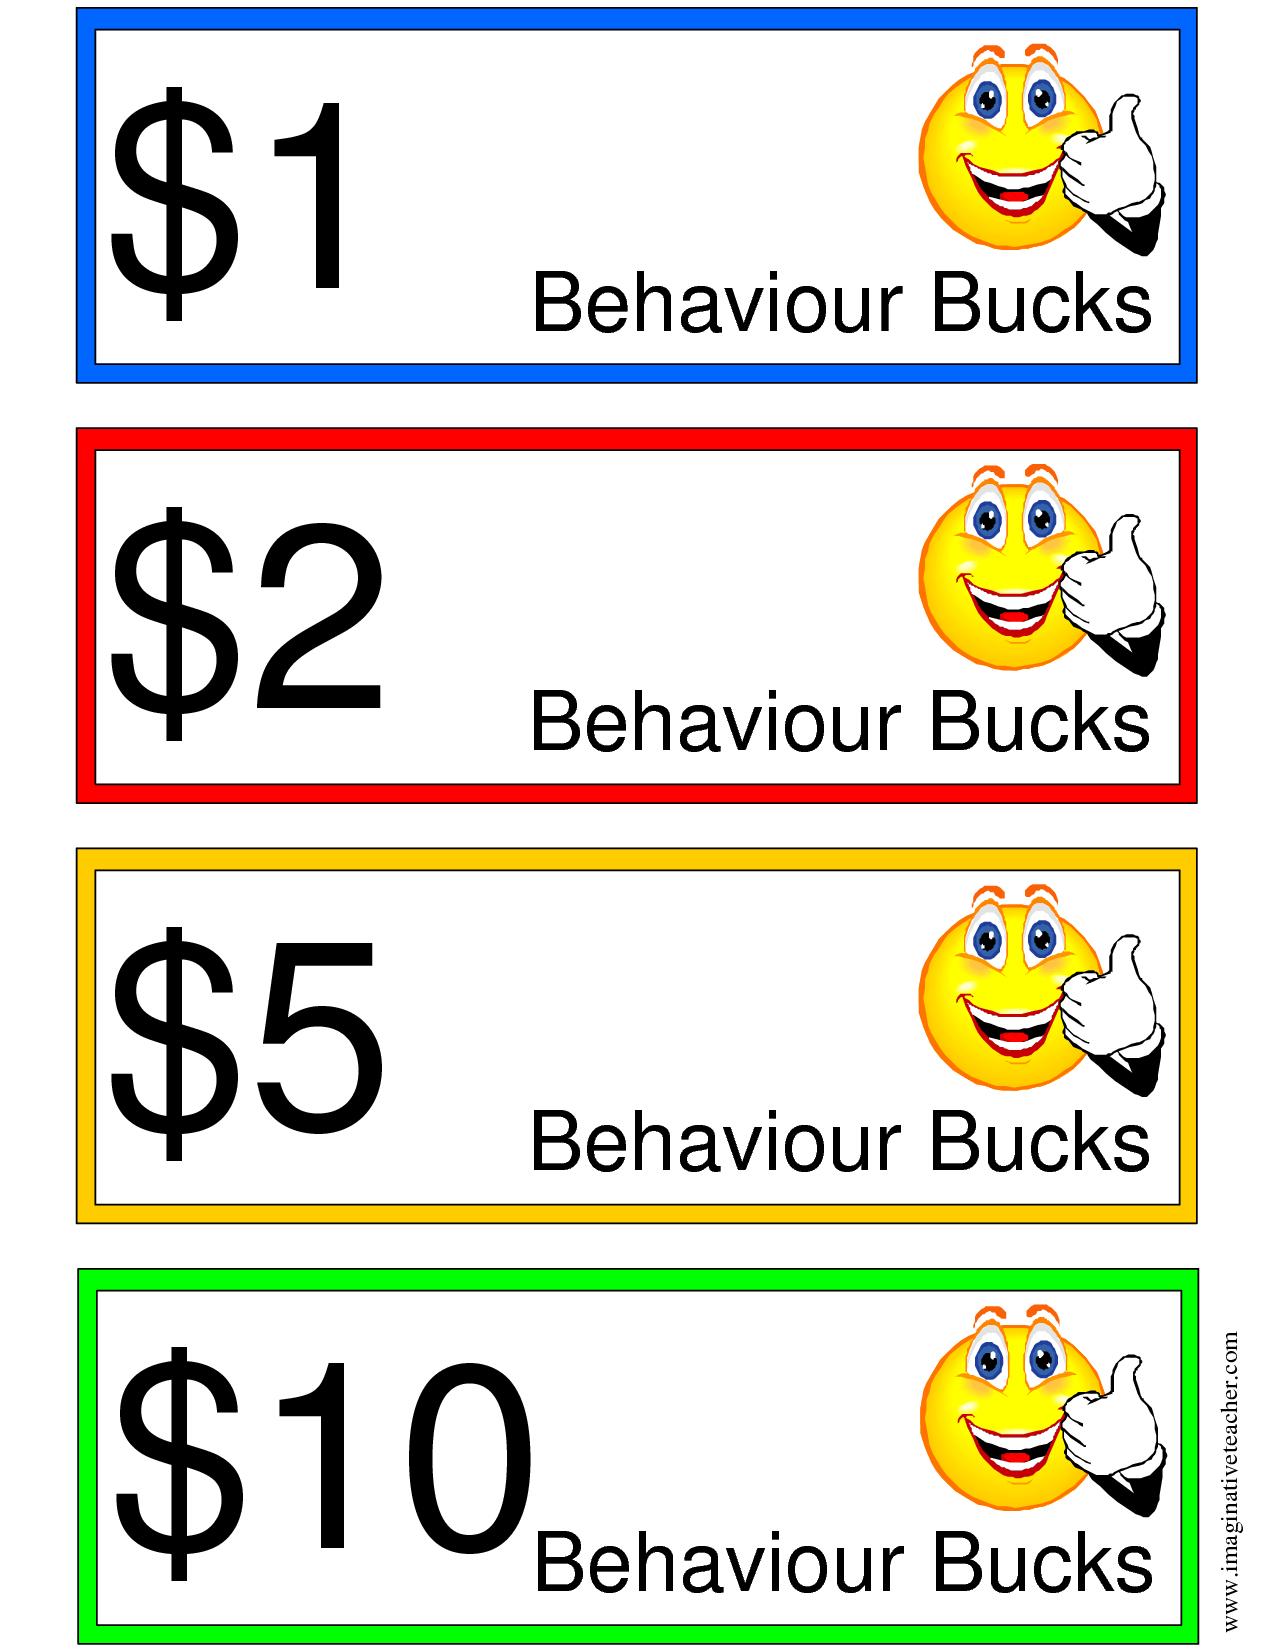 Good Behavior Bucks | Items Ship Free Printable Chores Print - Free Printable Chore Bucks